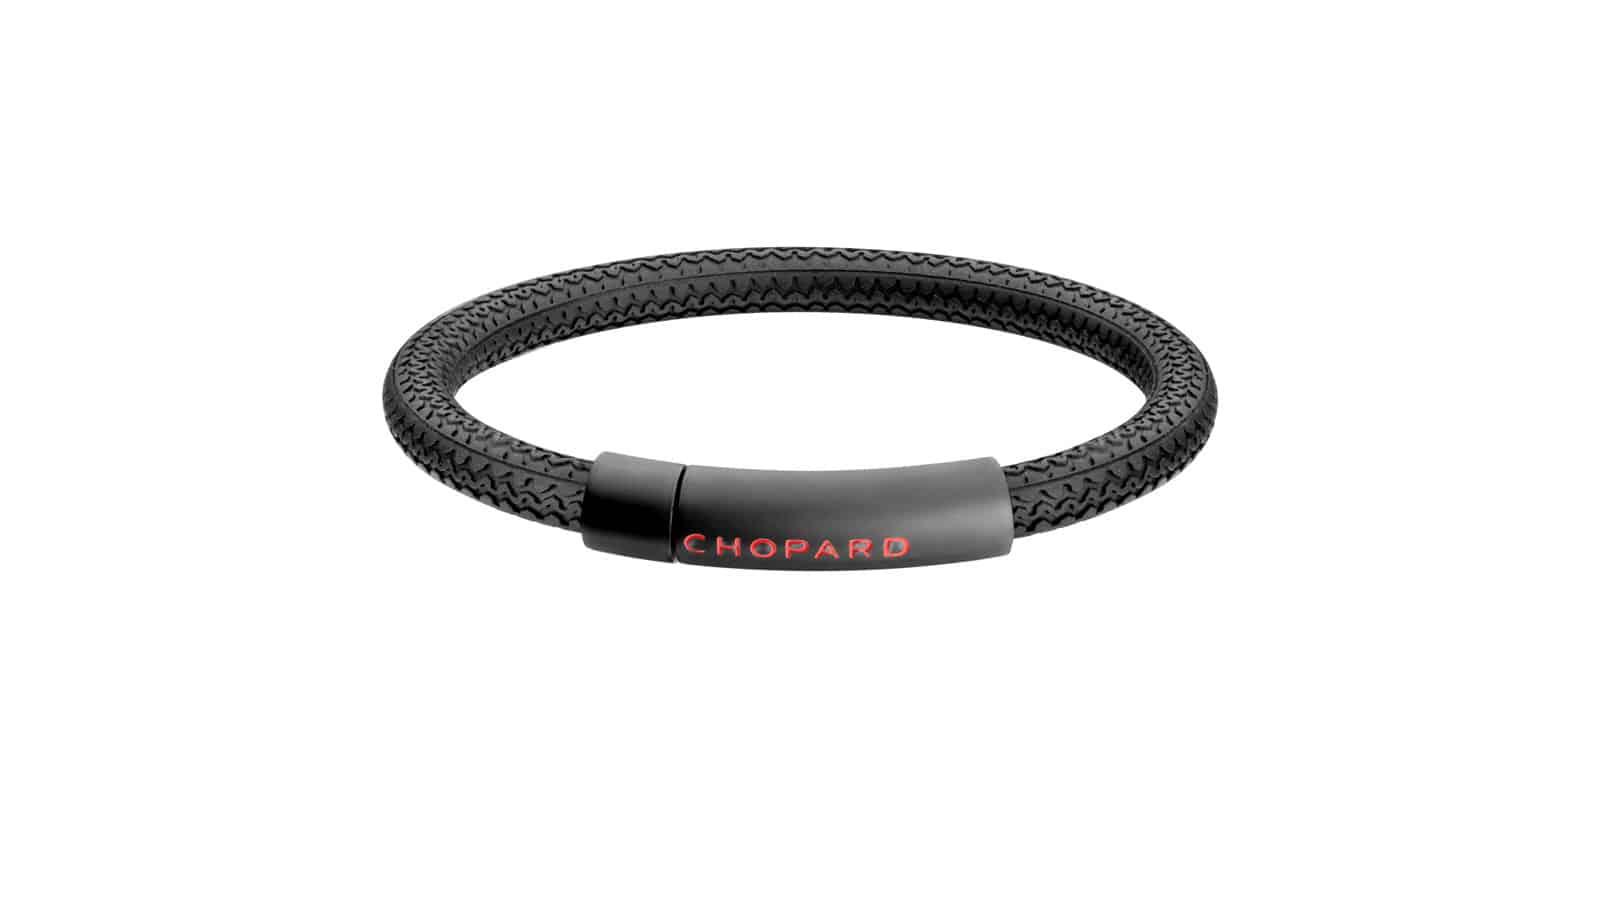 Bracelet-Chopard-Mille-Miglia-95016-0226-Lionel-Meylan-horlogerie-joaillerie-vevey